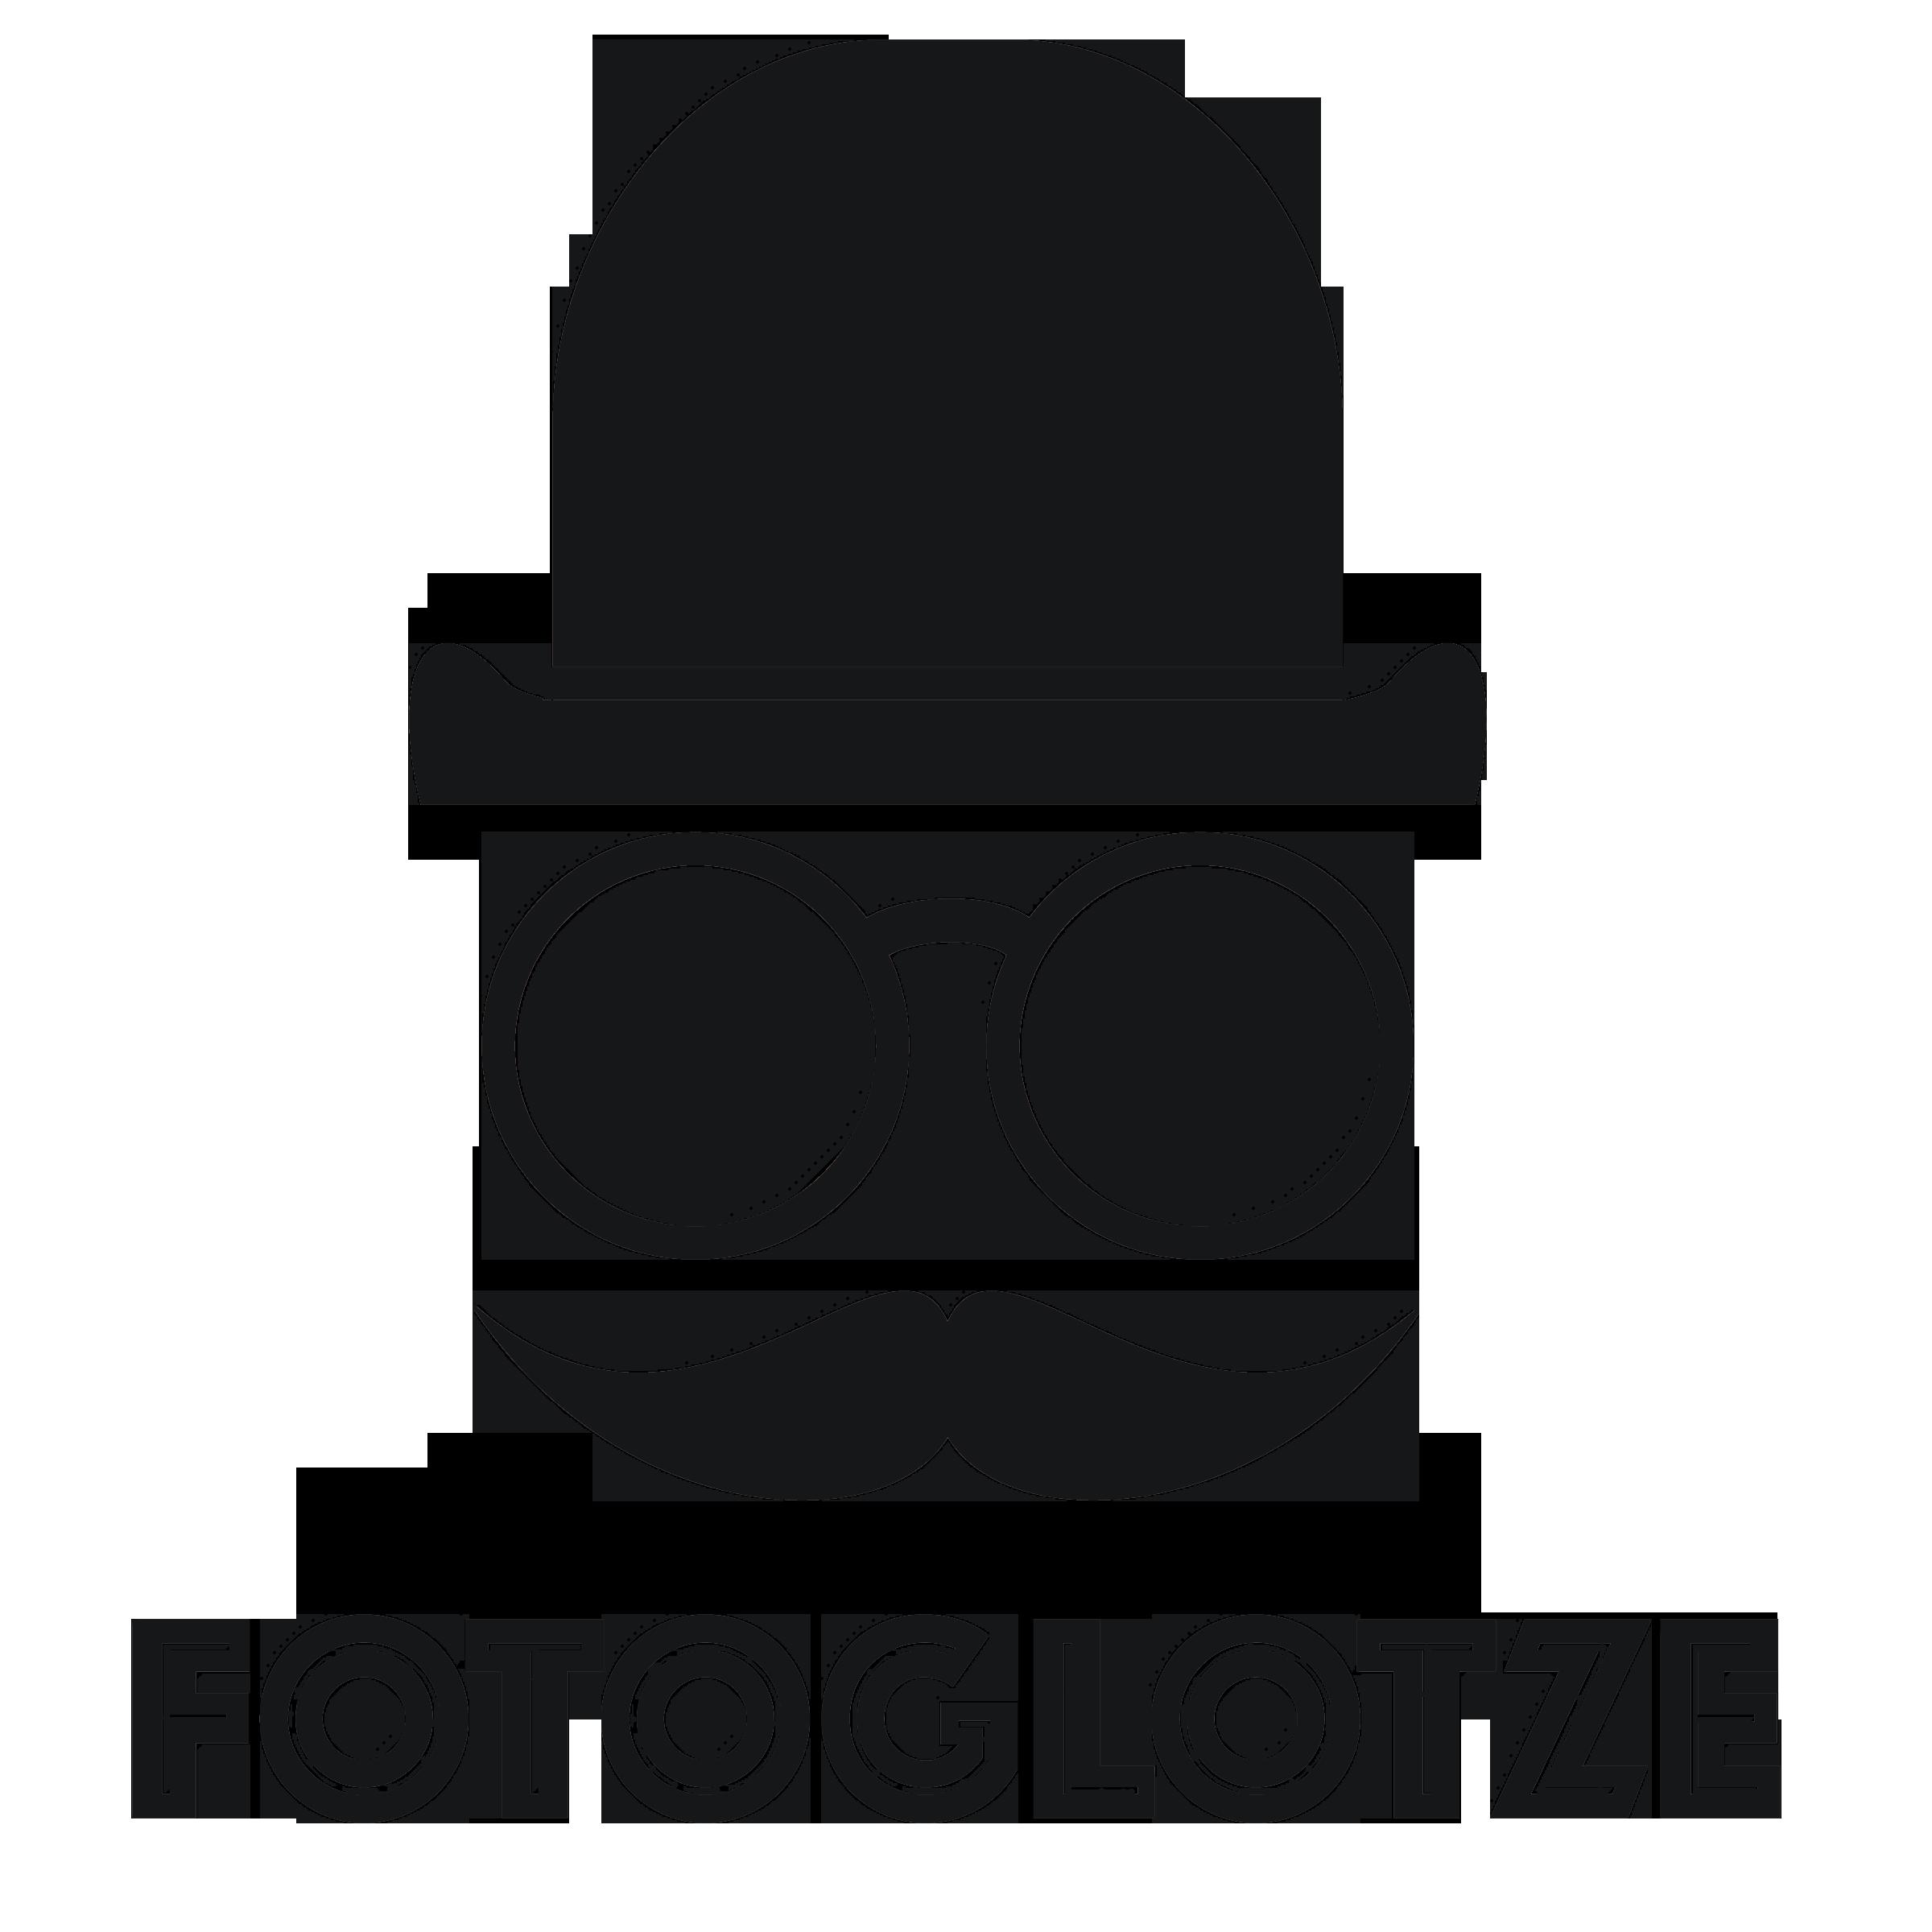 Fotobox | Fotoautomat | Fotoglotze | Fotokiste | Hannover | Lehmann | Eventservice